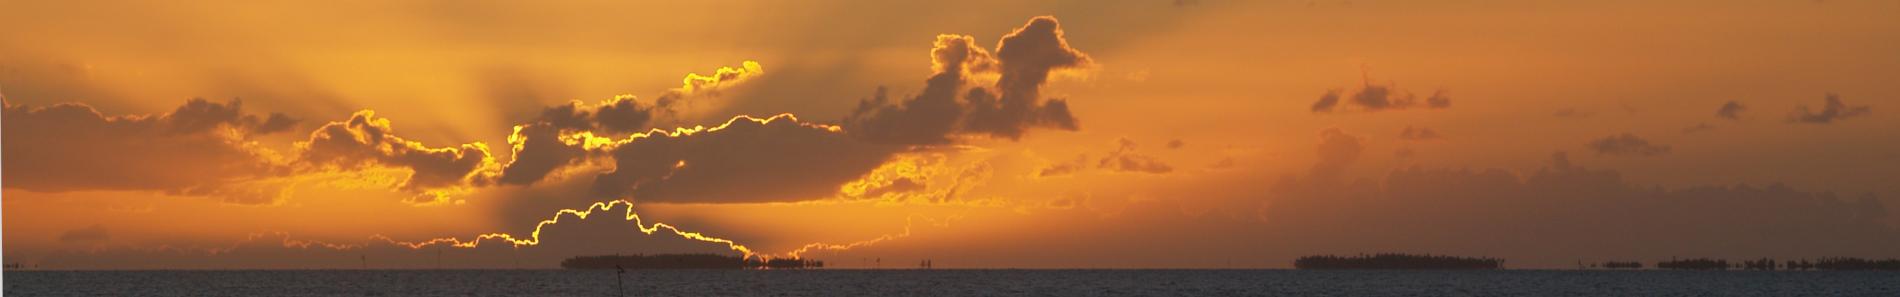 Nantucket Sunrise Sailtraining